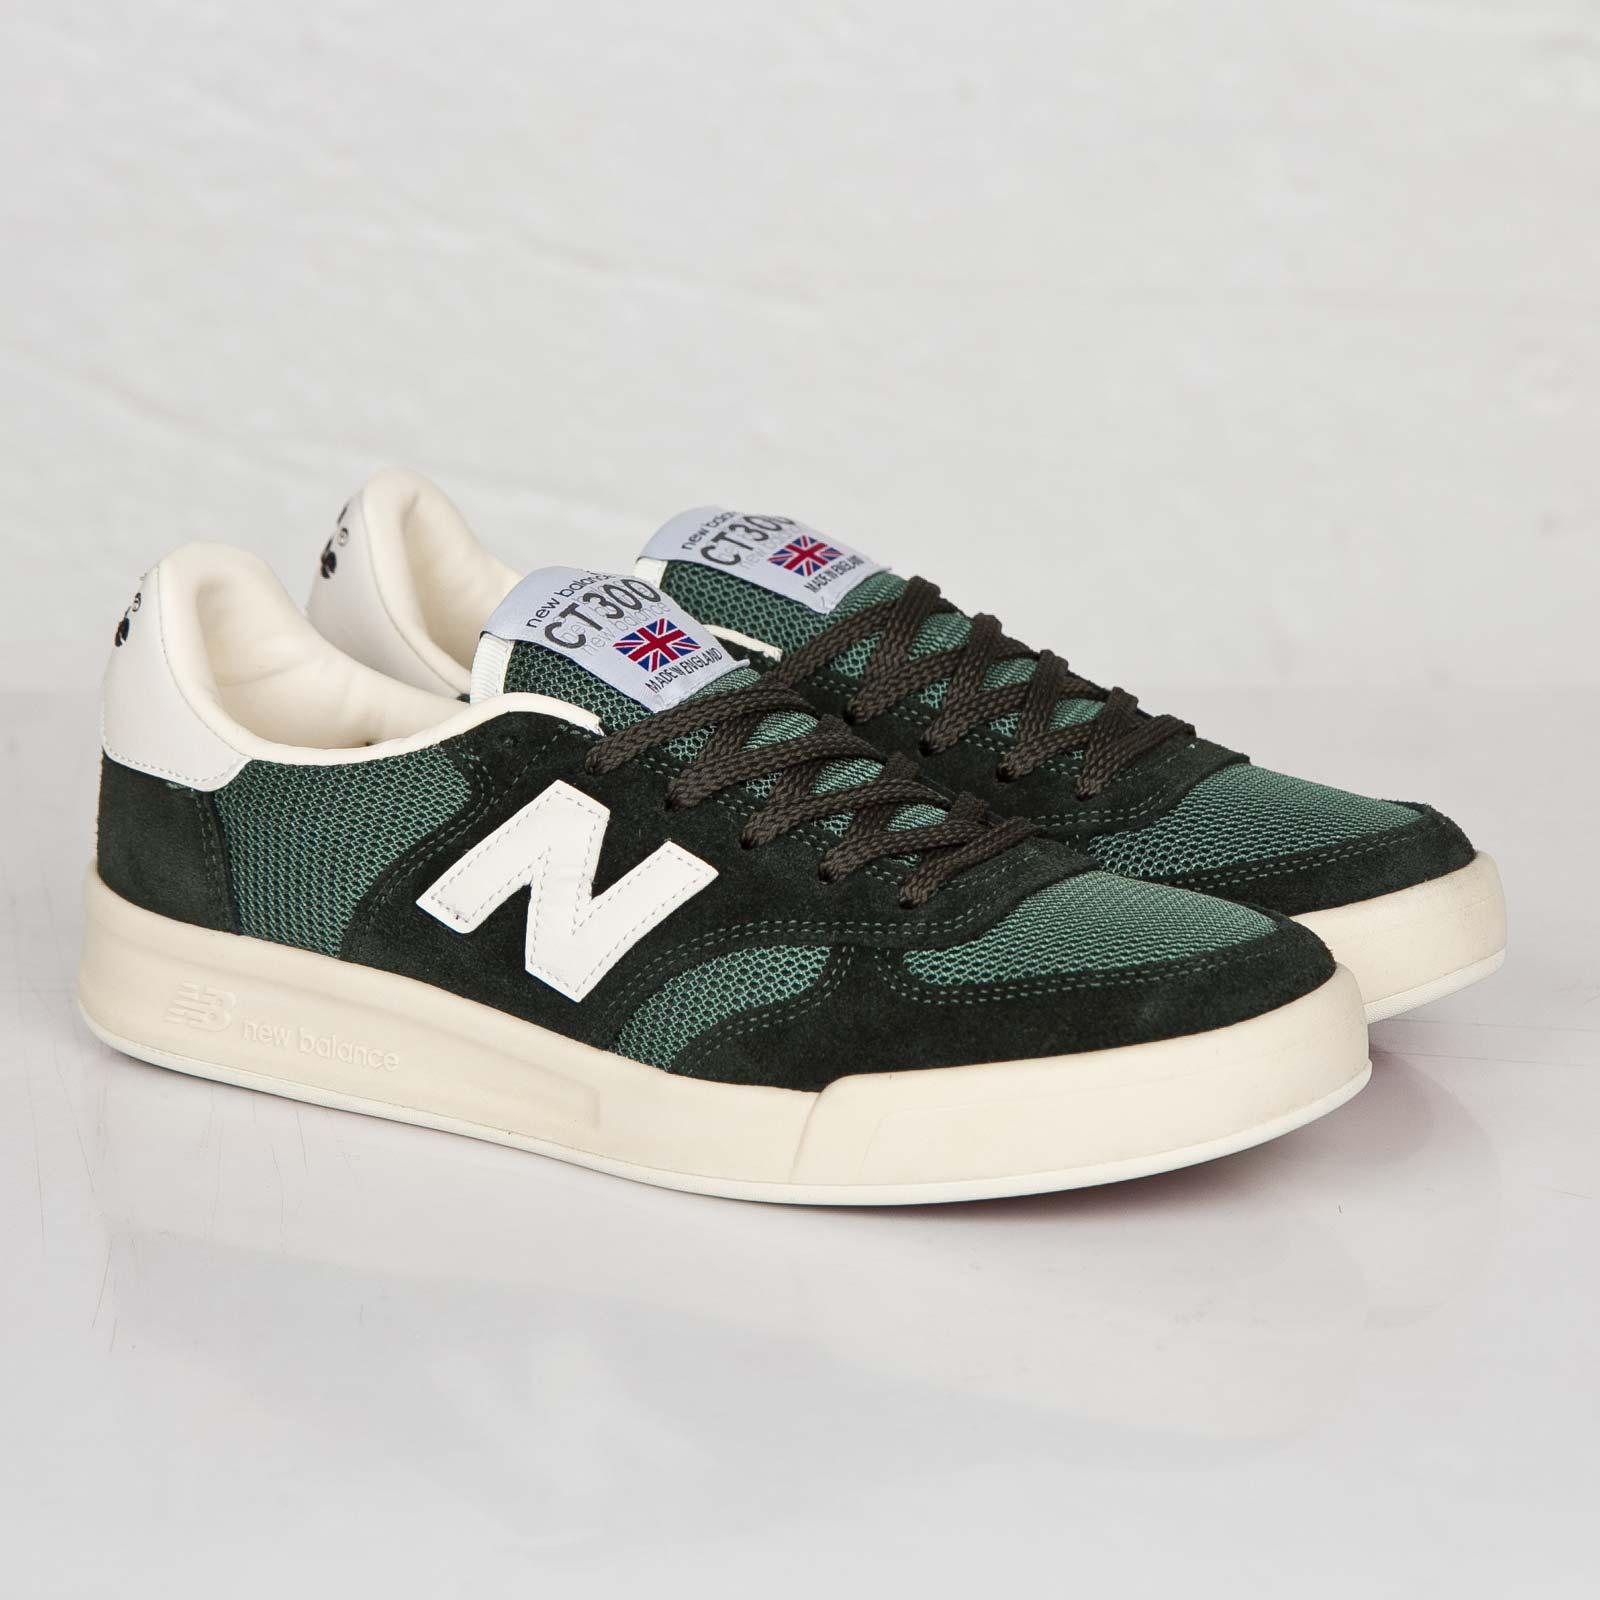 New Balance CT300 - Ct300sbw - SNS | sneakers & streetwear online ...